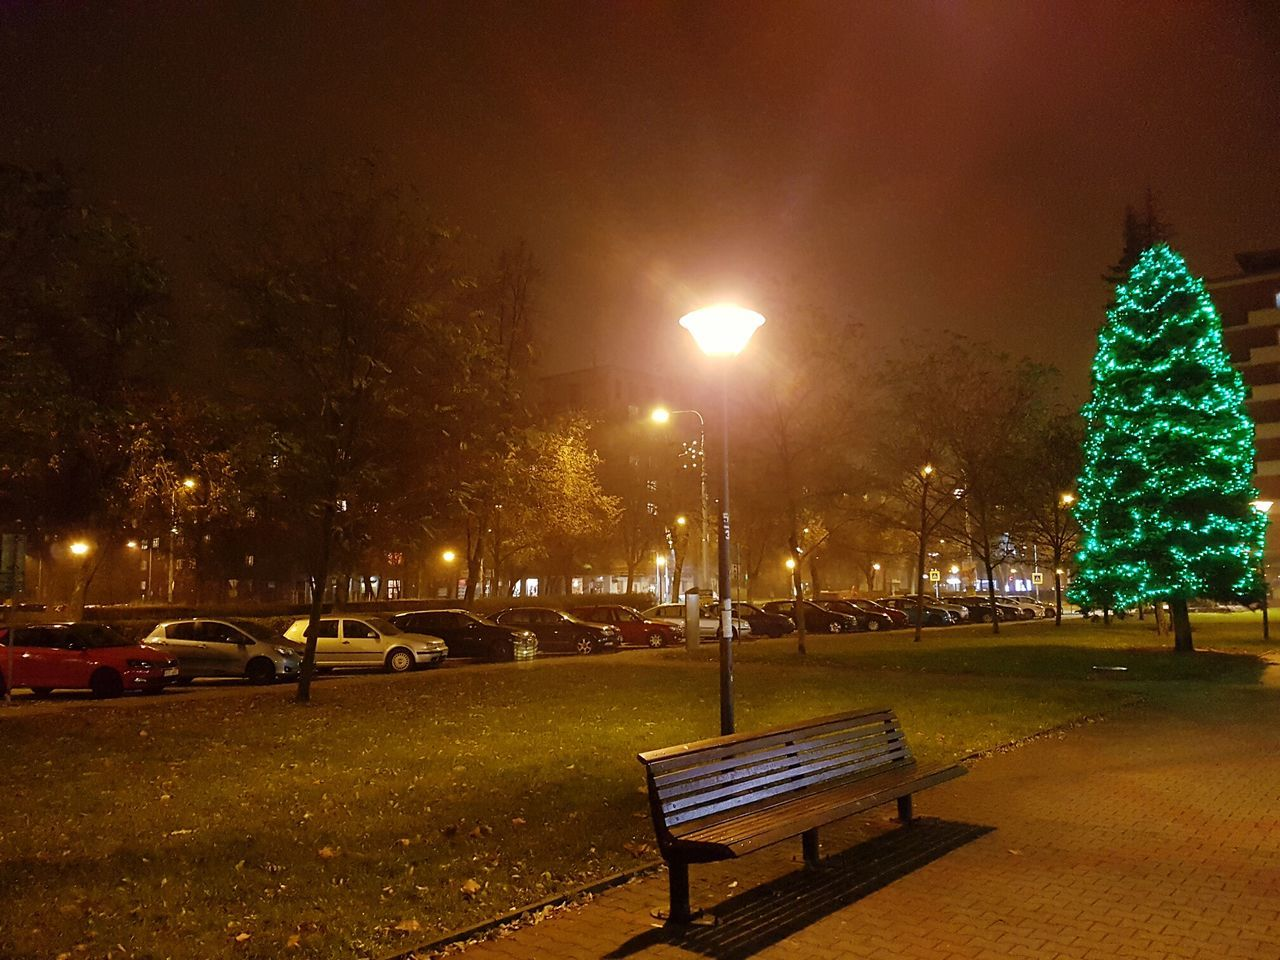 Night Illuminated Tree No People Outdoors Sky Nature Czech Republic🇨🇿 Road Car Night Lights Plaza Christmas Ornament Christmas Tree Ostrava